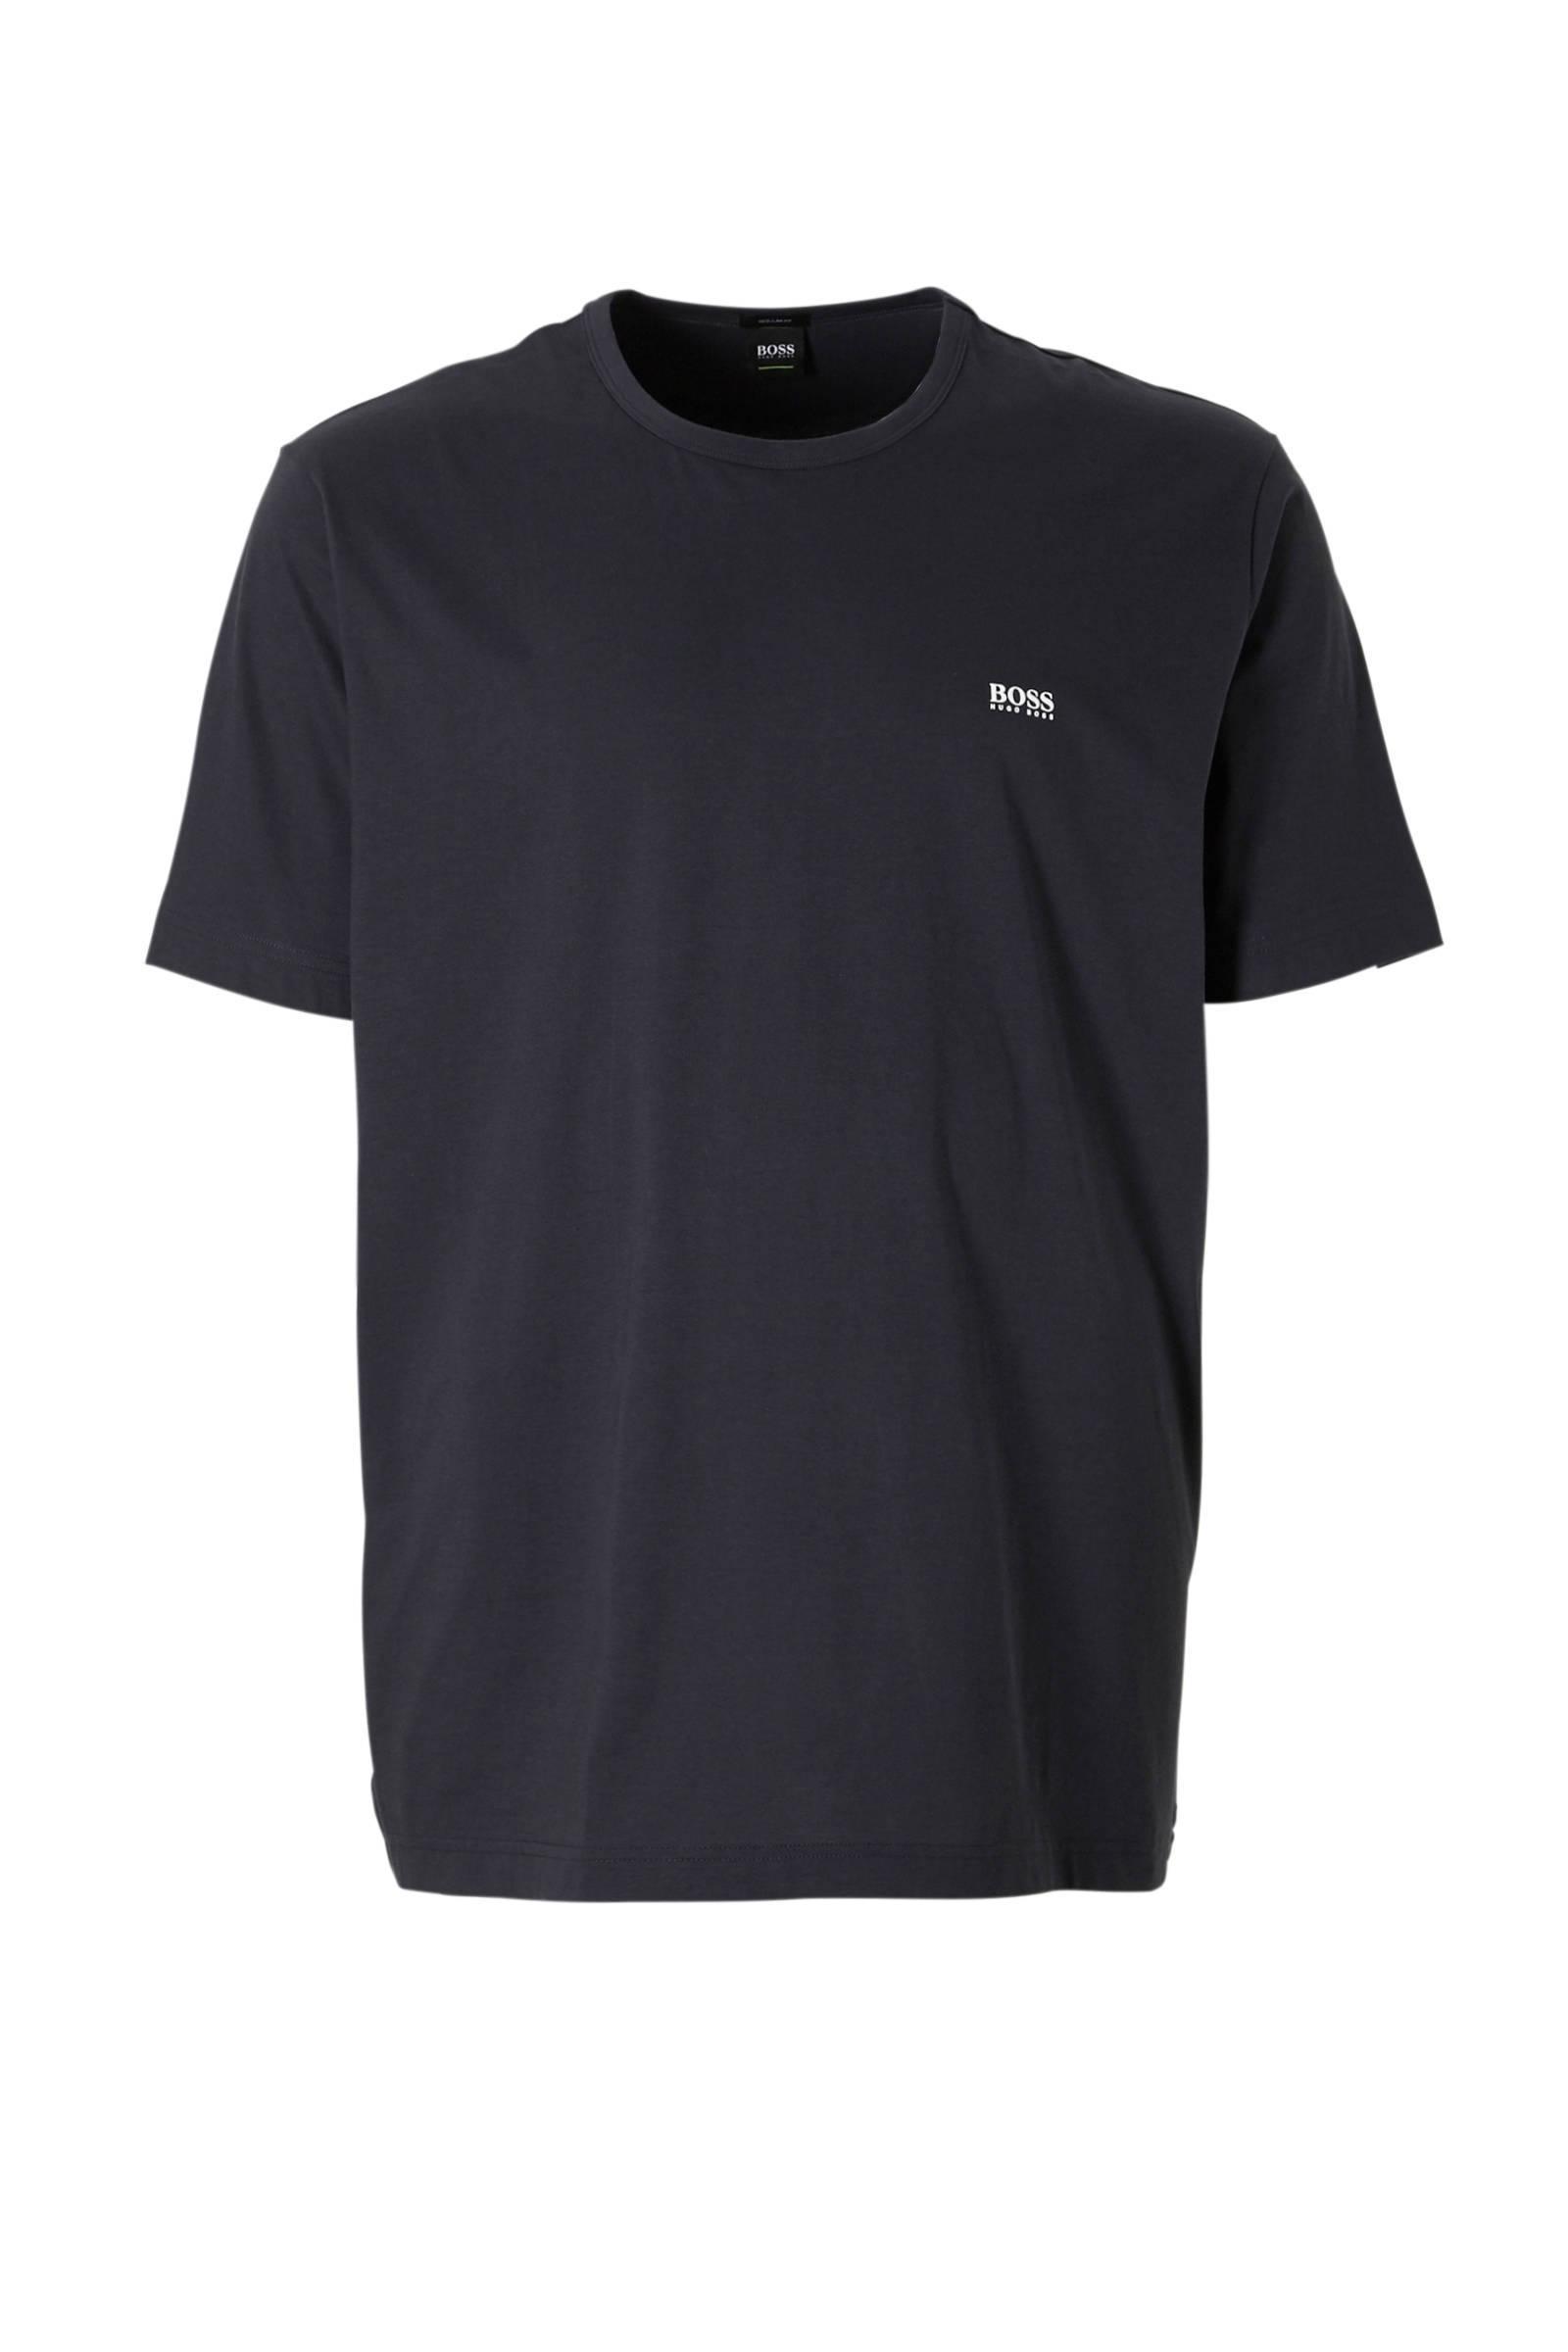 Boss Green Big & Tall +size T-shirt